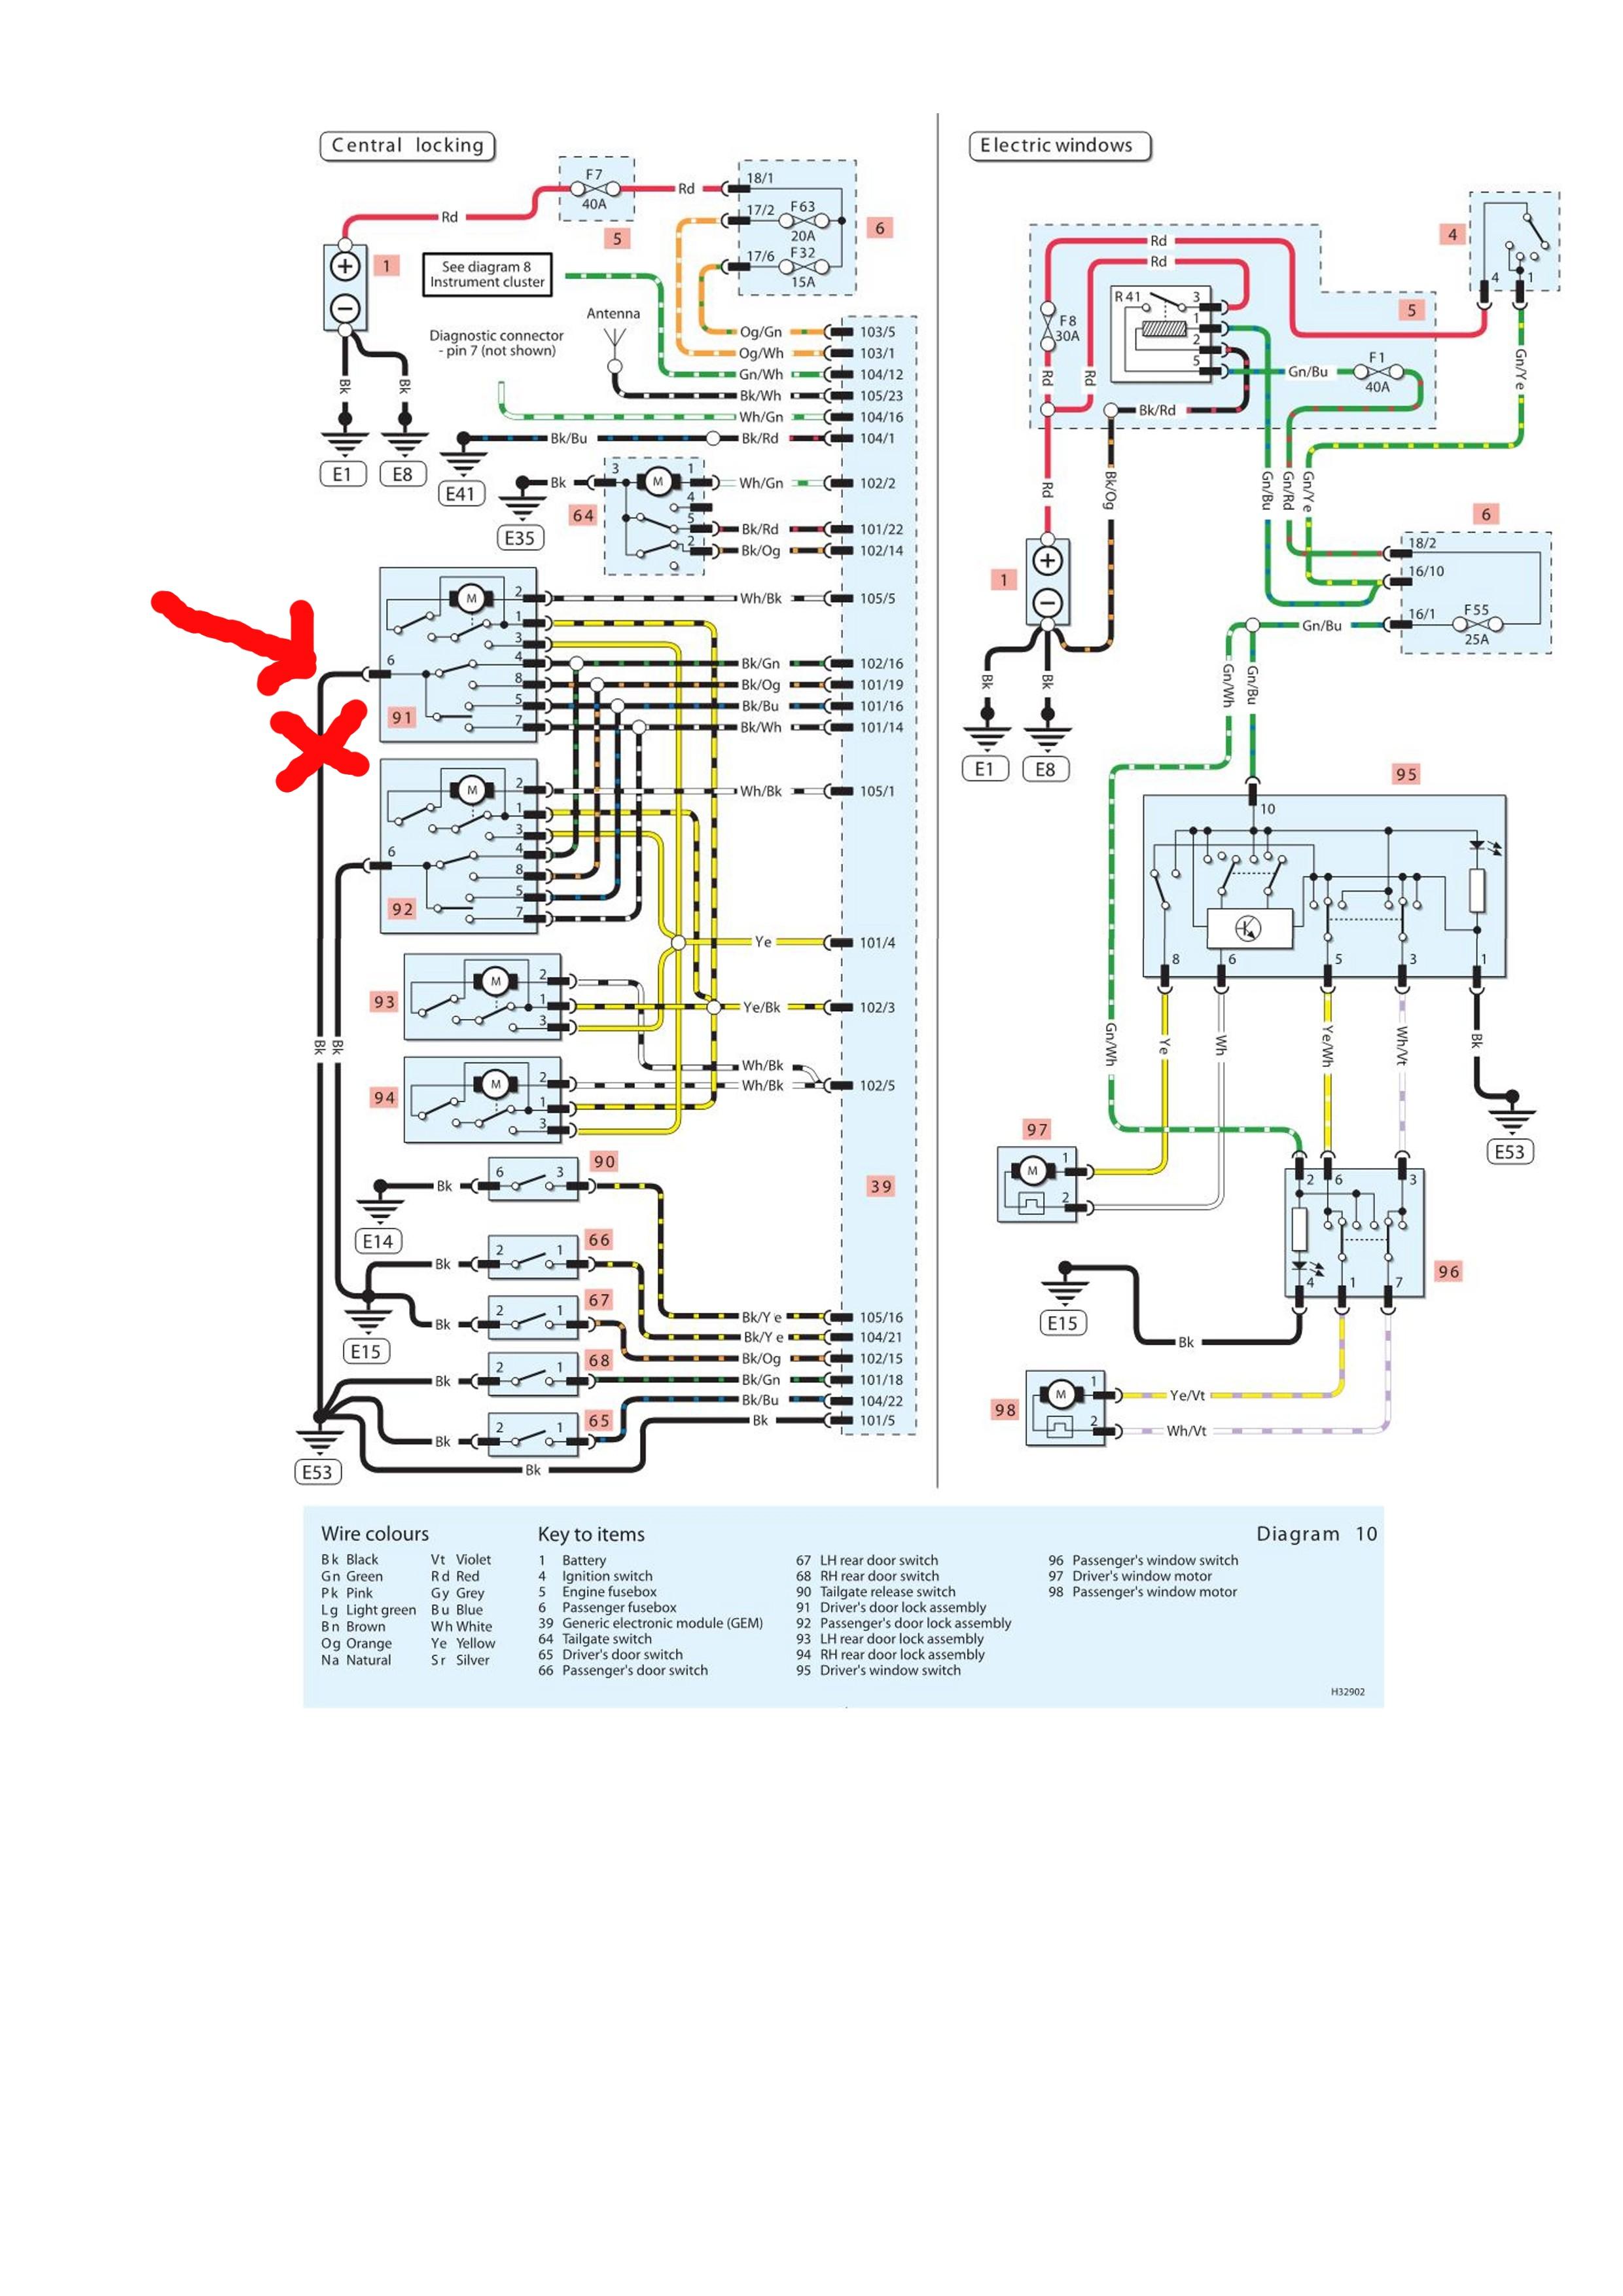 Ford Focus 1.8 TDDI 2002r. - schemat instalacji elektrucznej